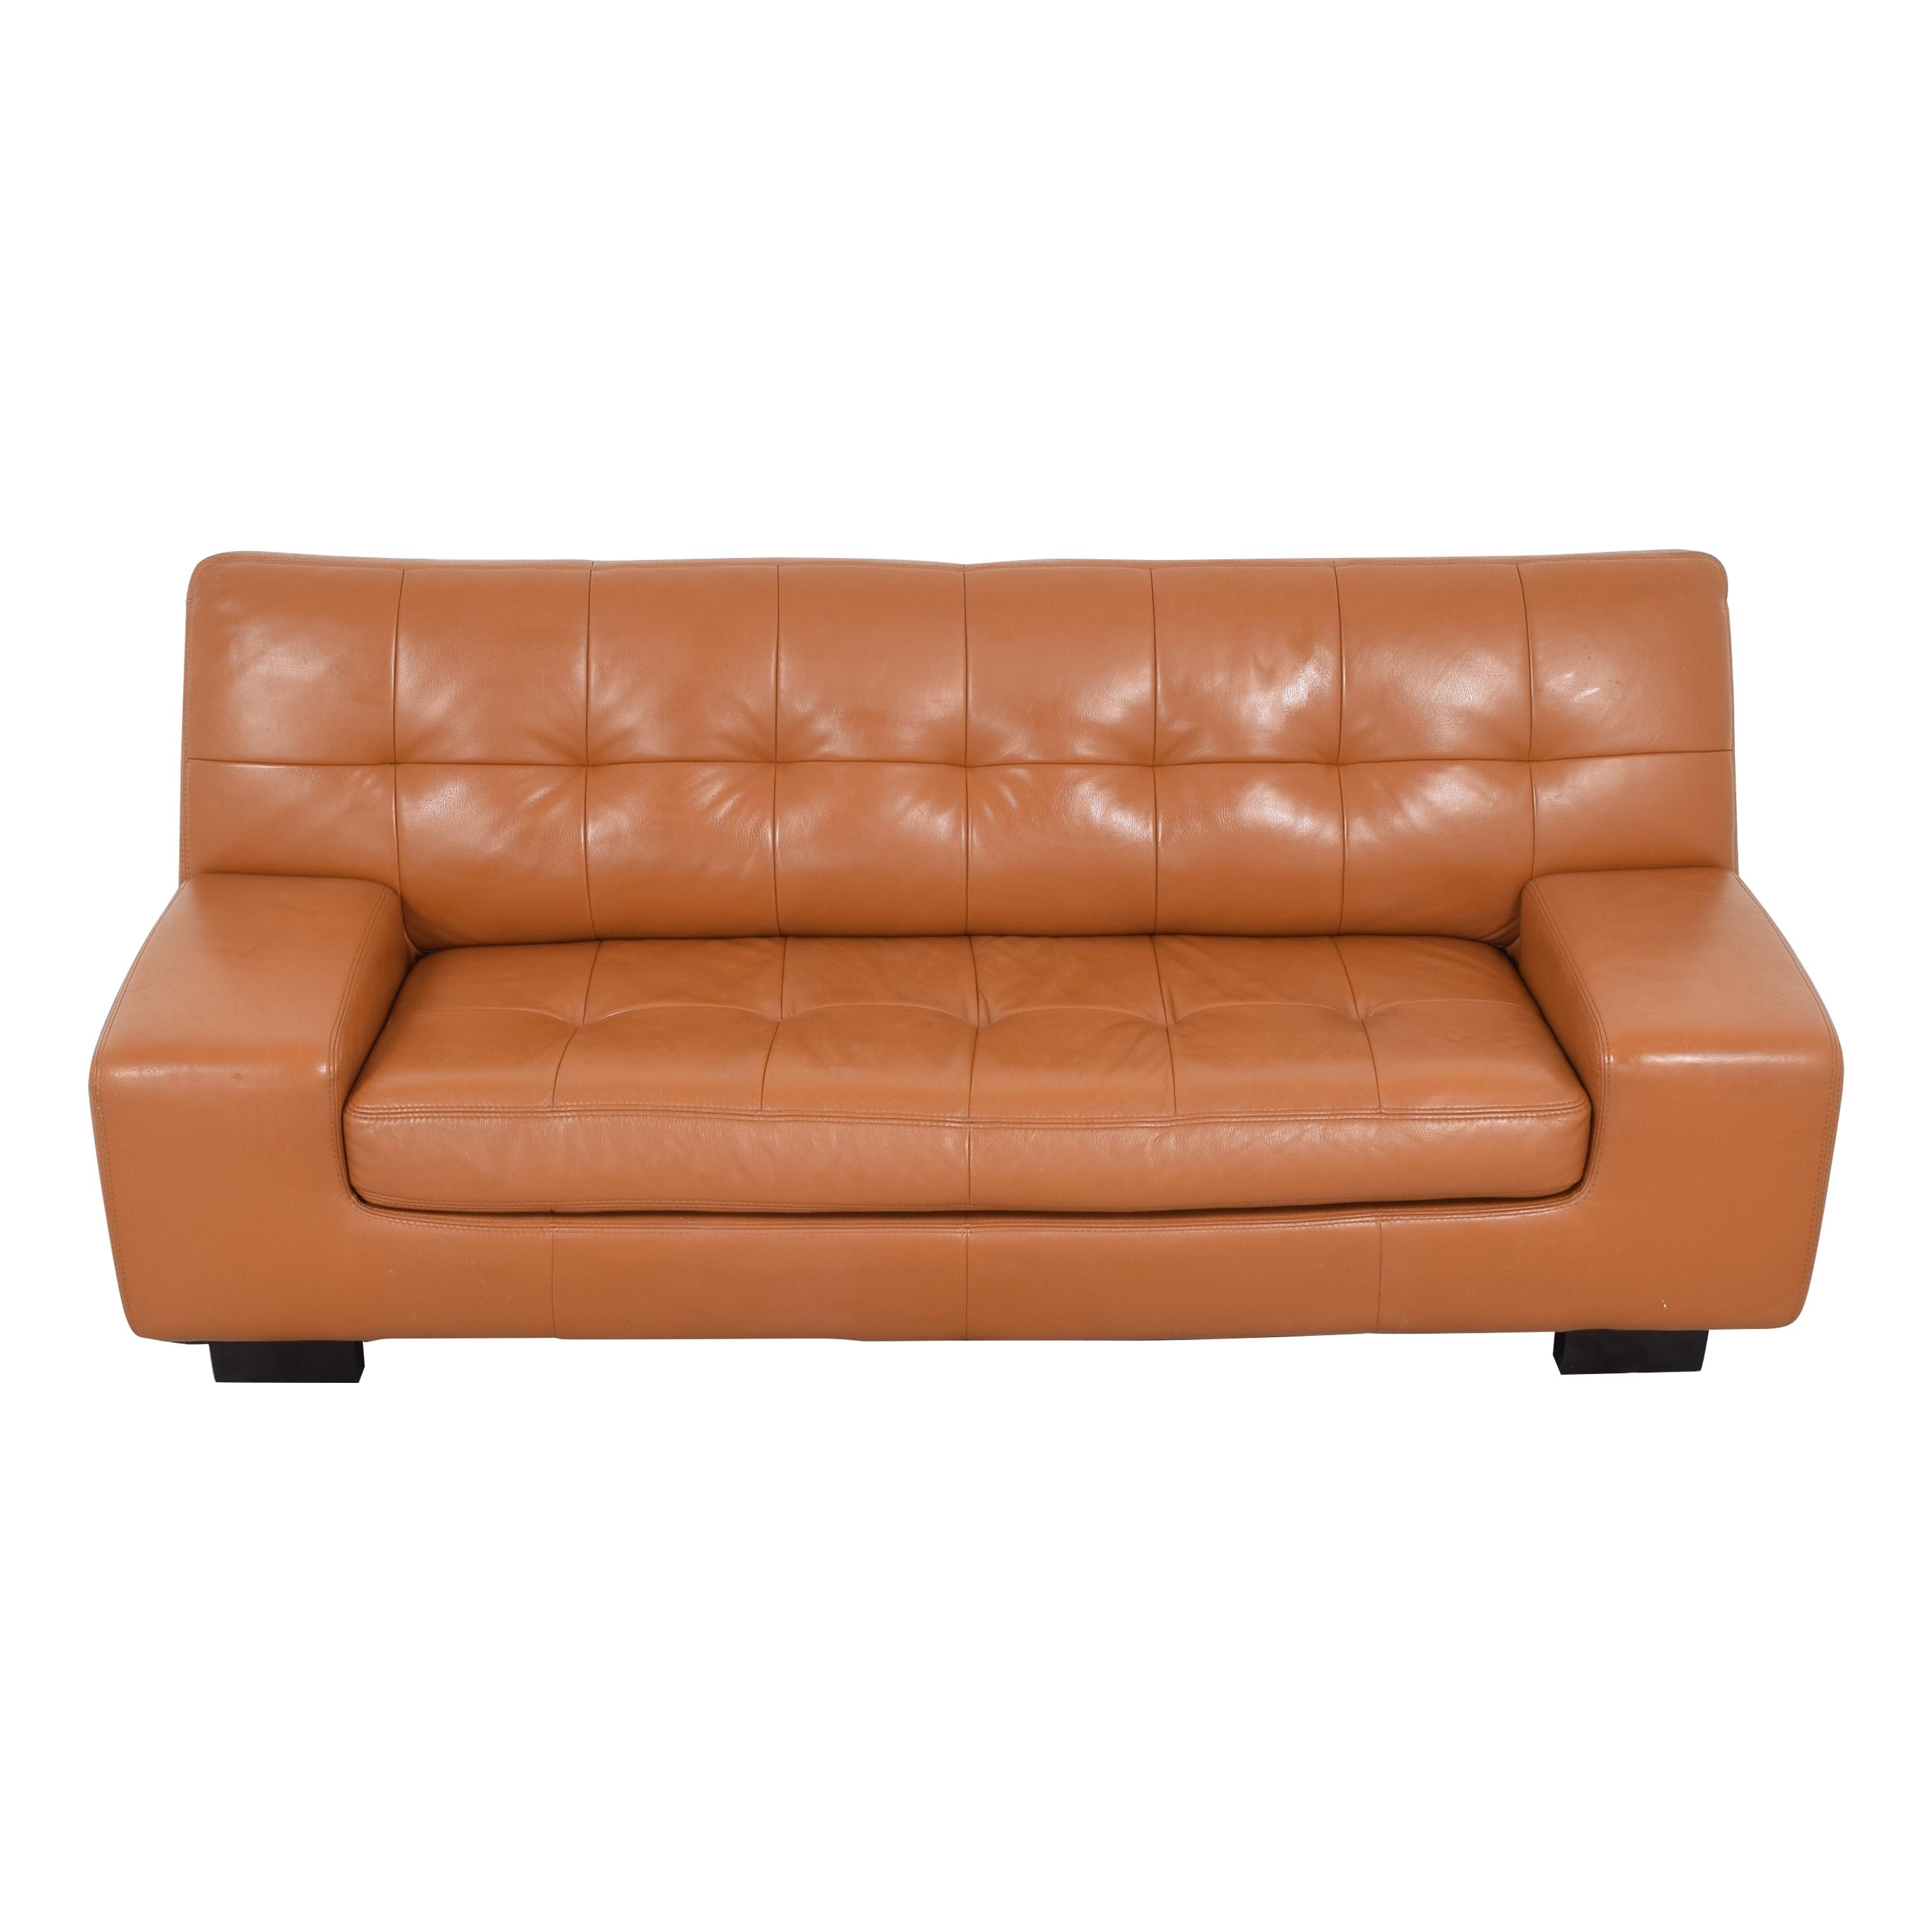 W Schillig Mandalay Sofa